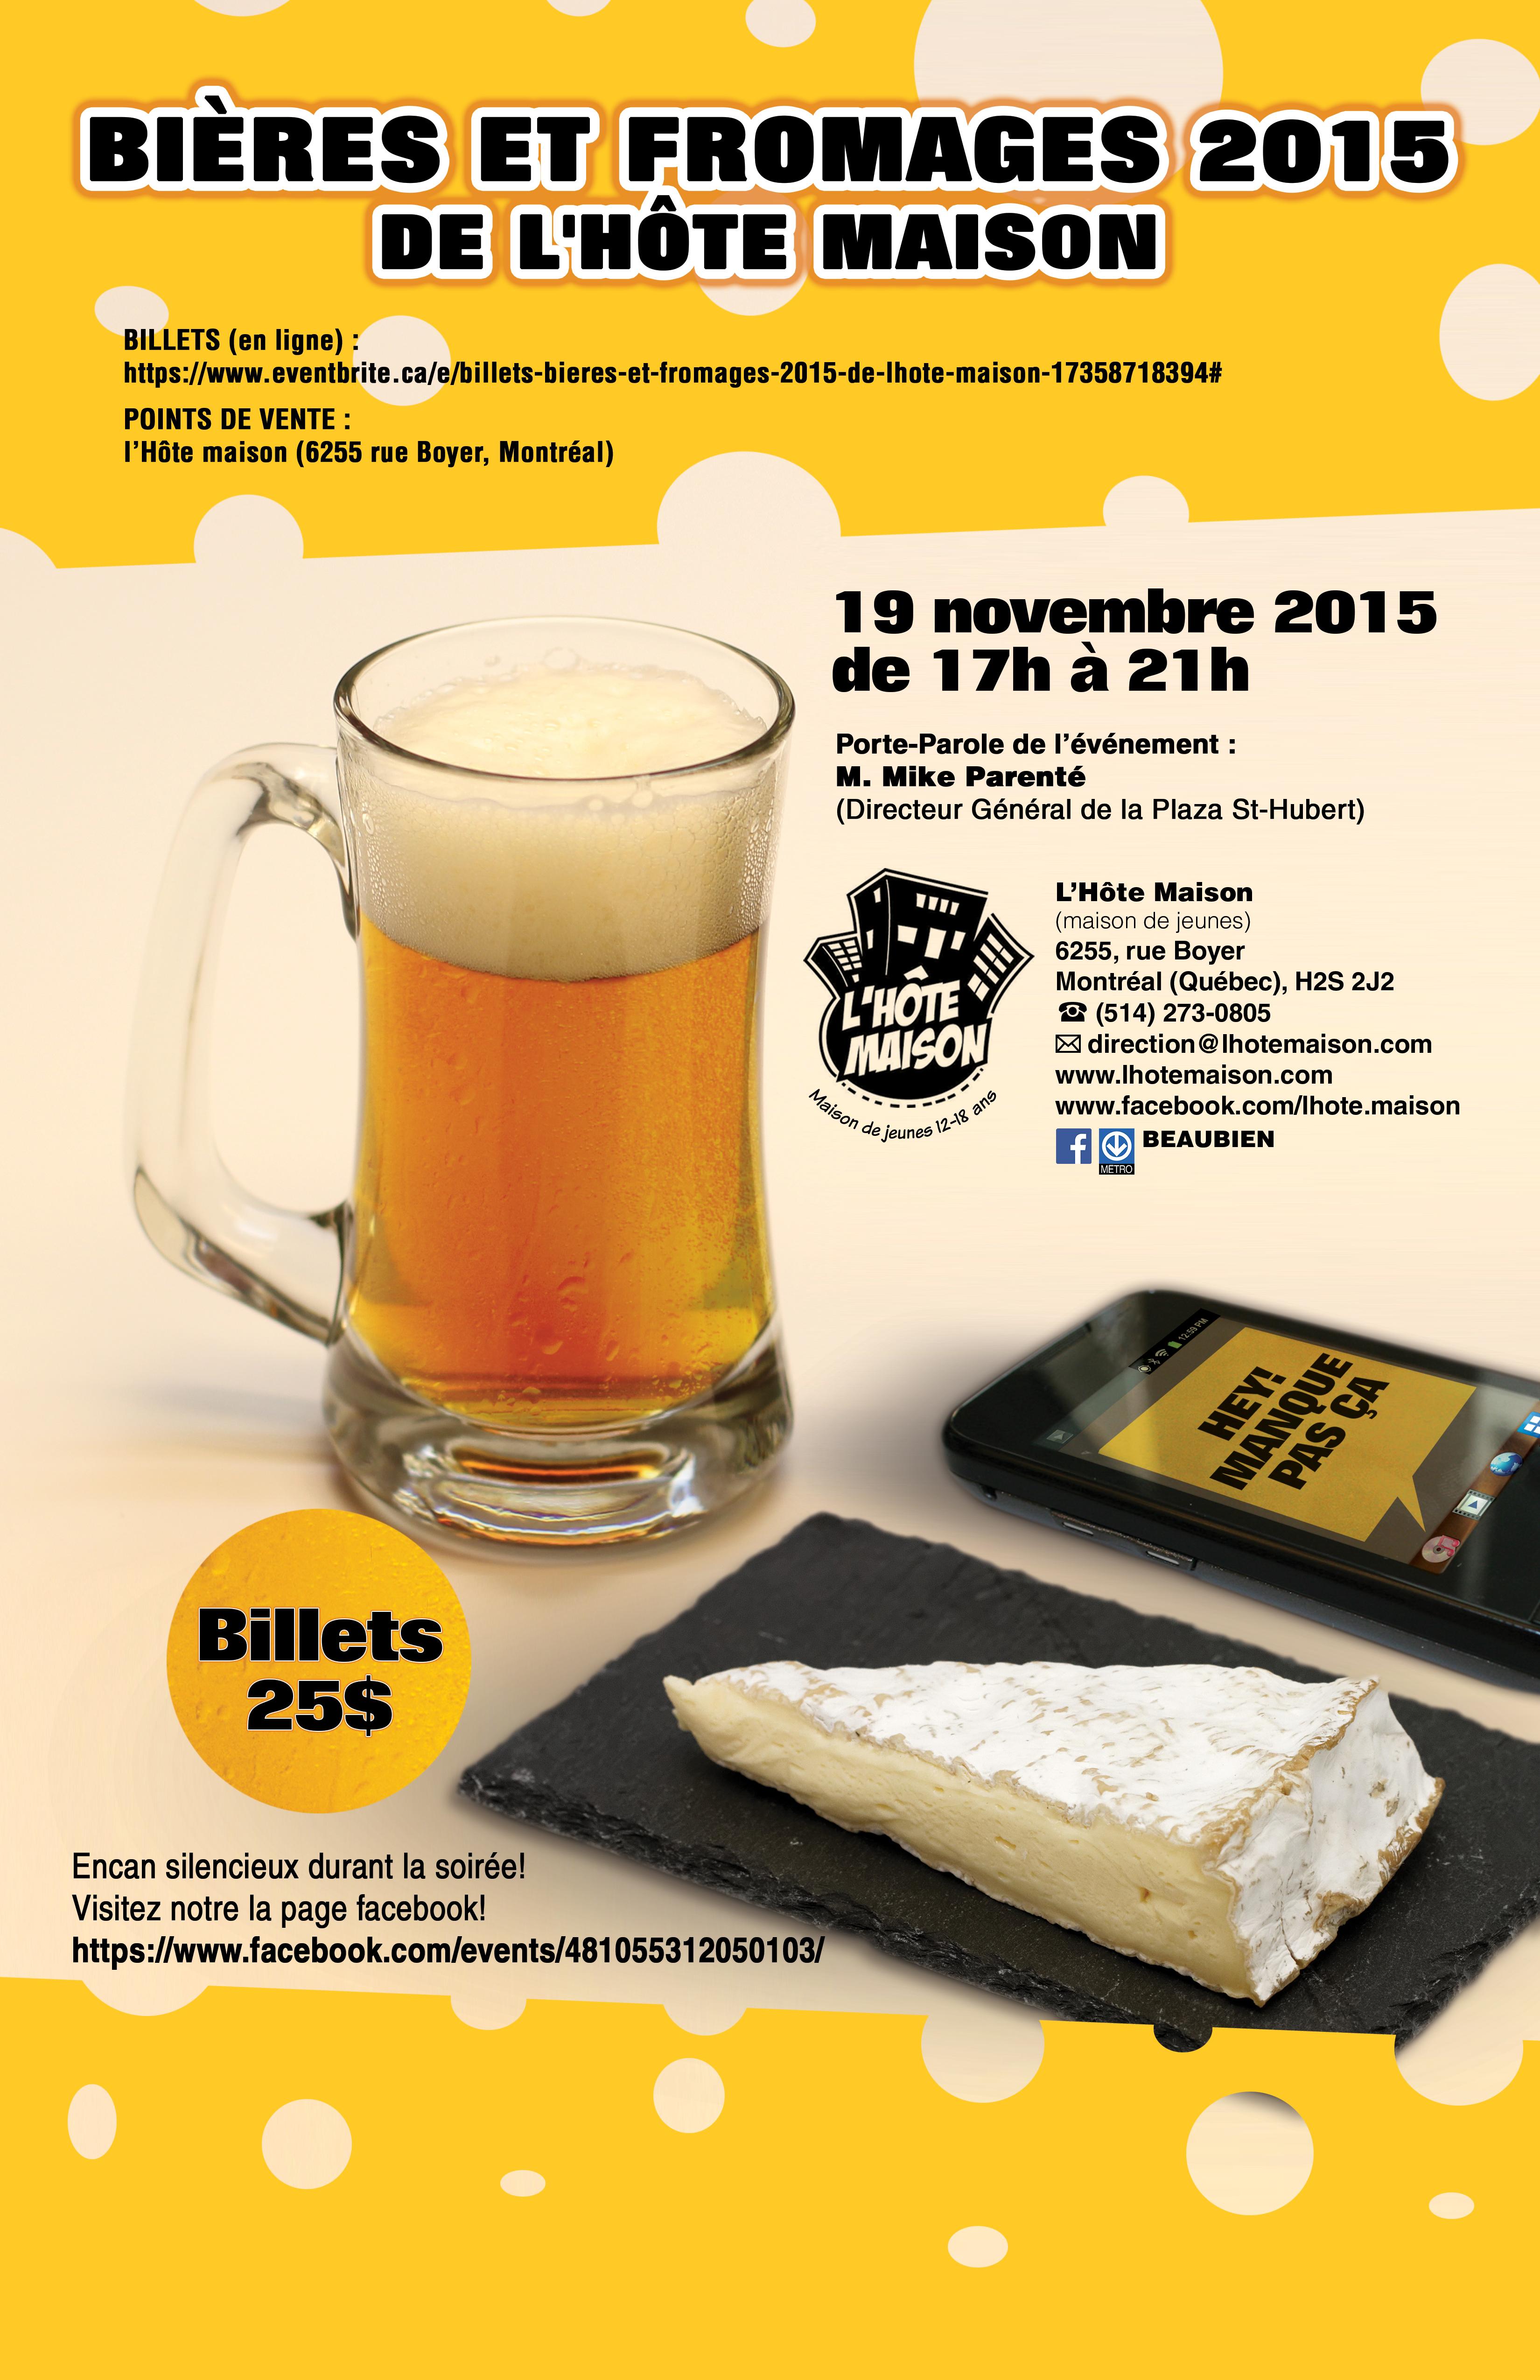 biere-et-fromage